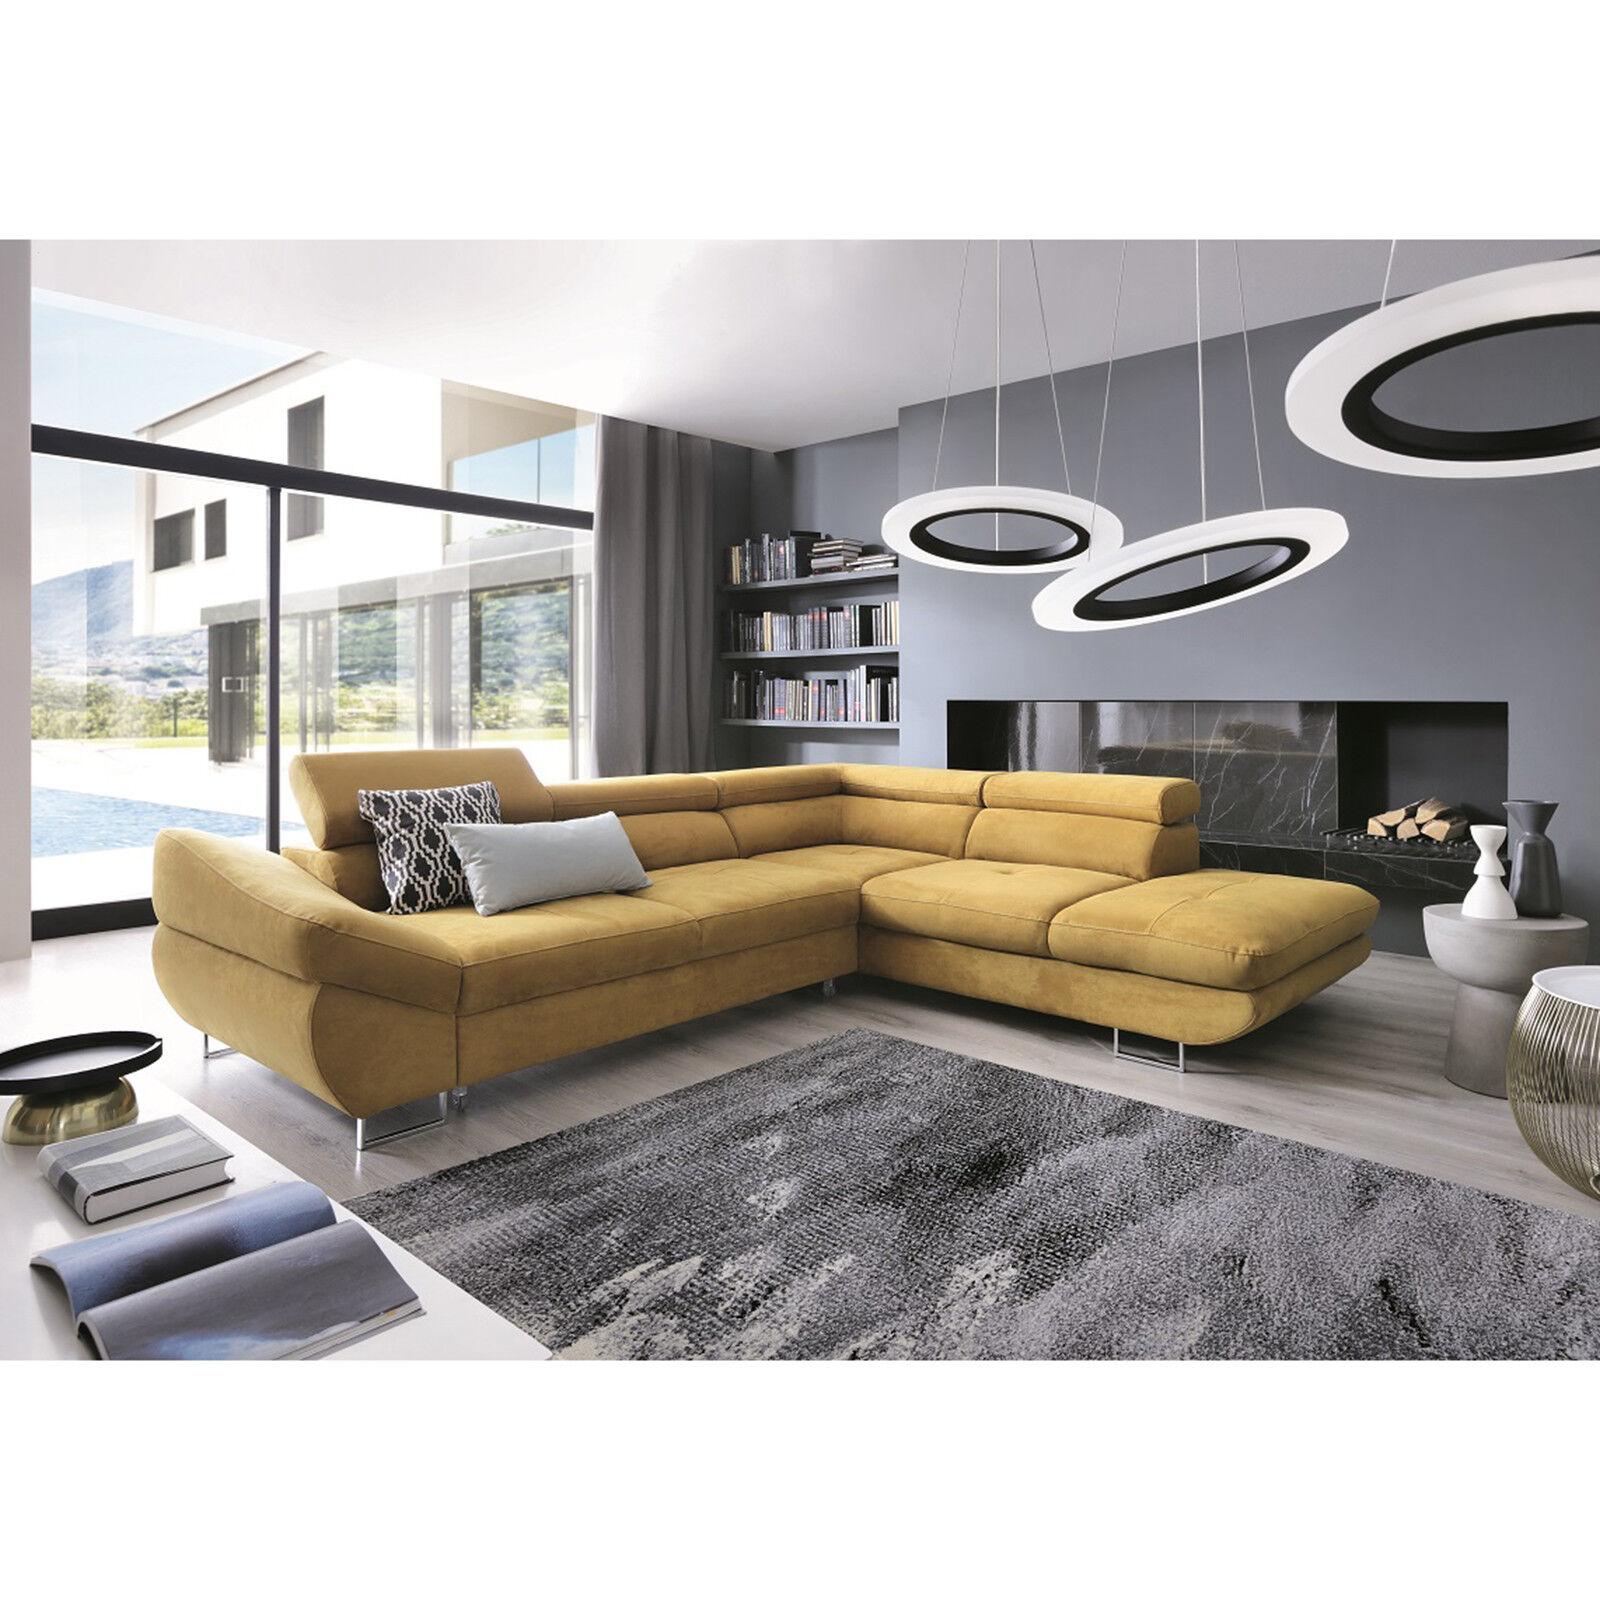 Details about Msofas Fabio Large Corner Modern Yellow Storage SofaBed  Living Room Furniture